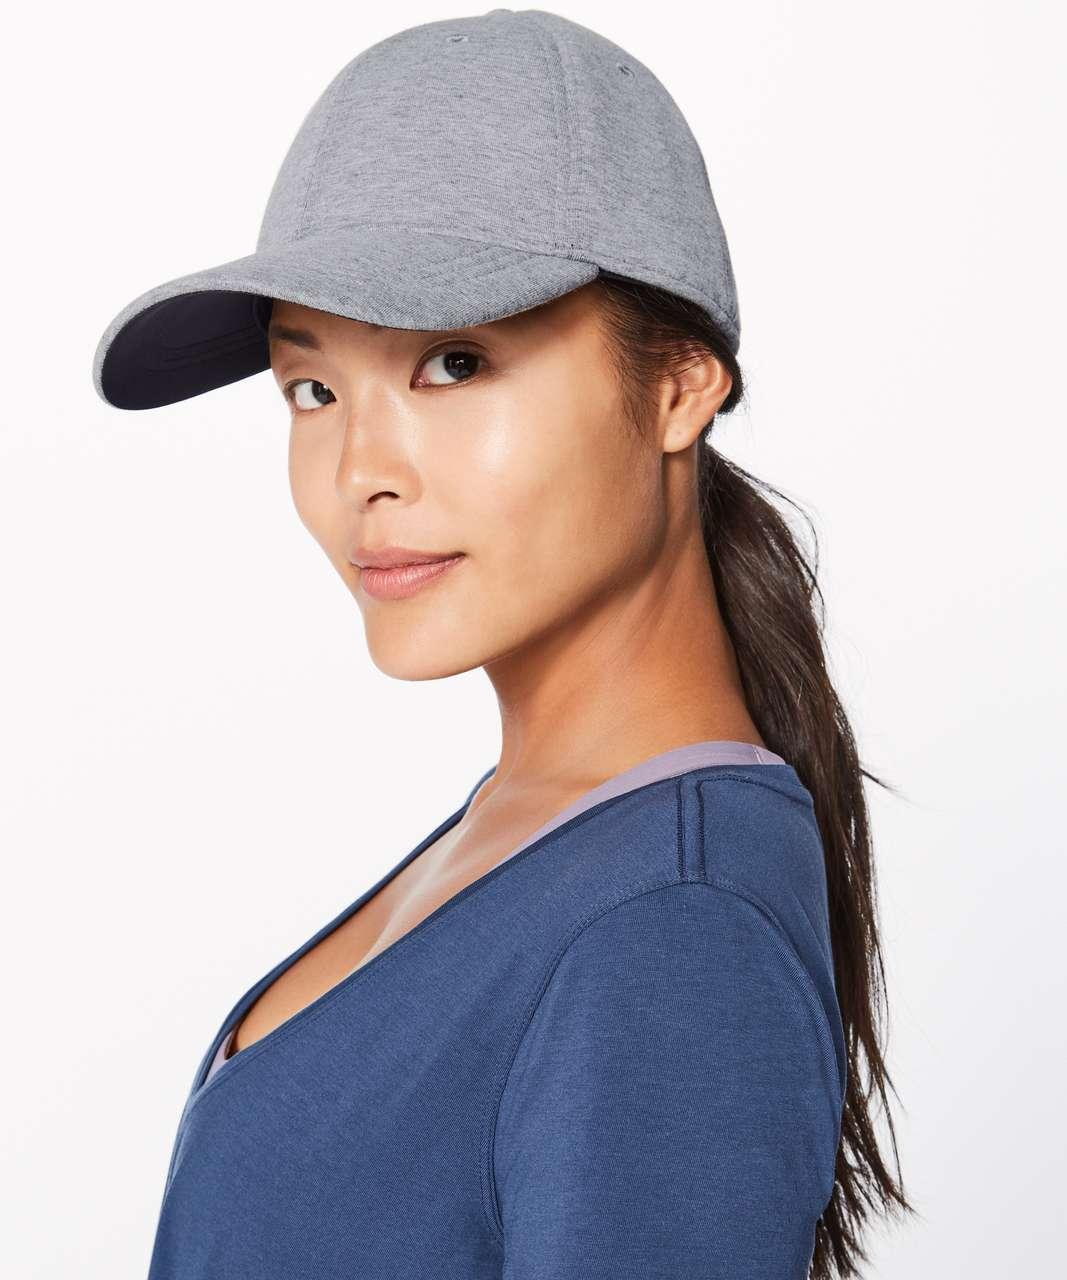 4be744595a29d Lululemon Baller Hat - Heathered Core Medium Grey - lulu fanatics